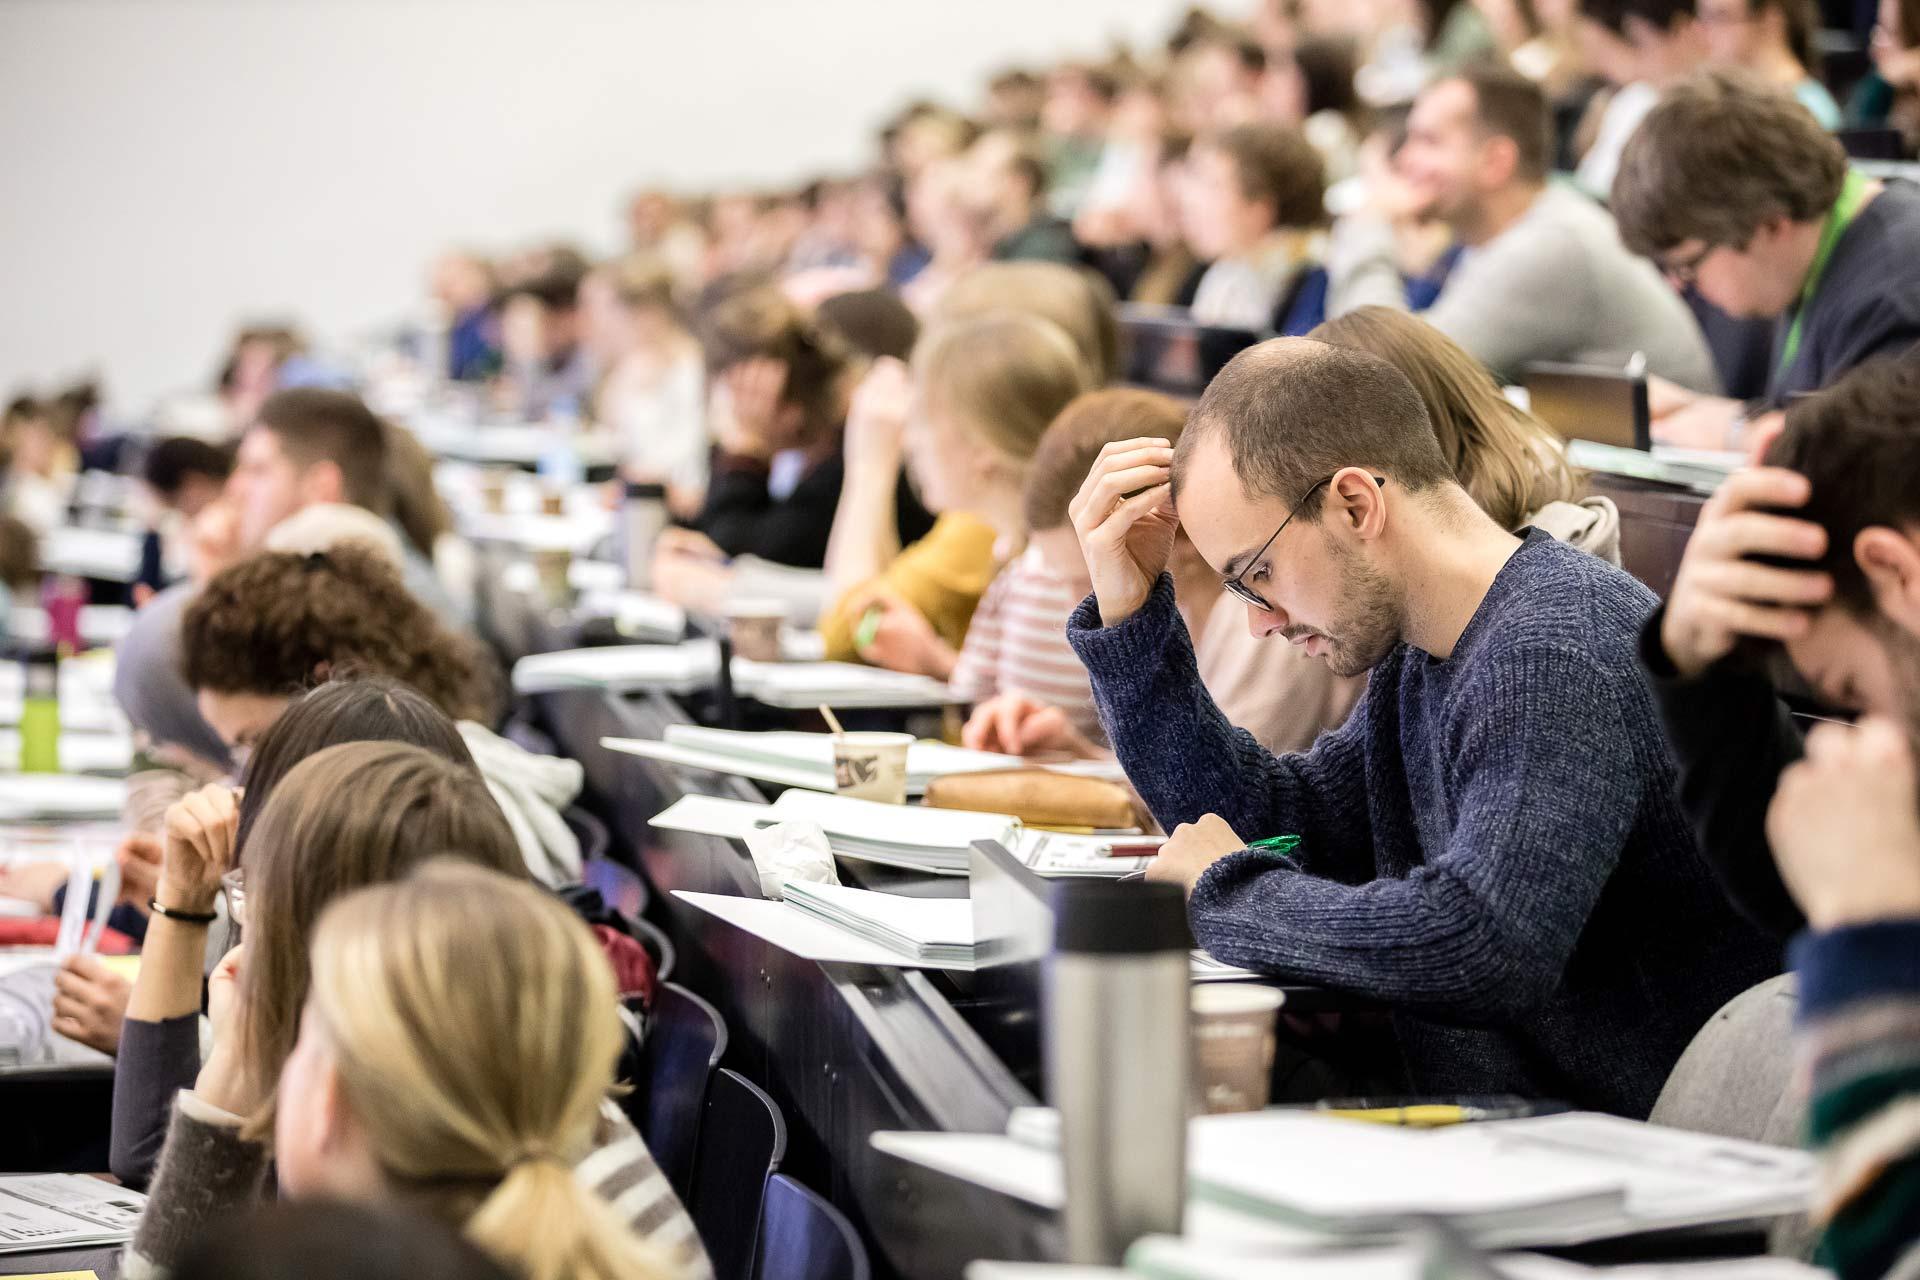 fotograf-universitaet-kongress-medizin-eventfotos